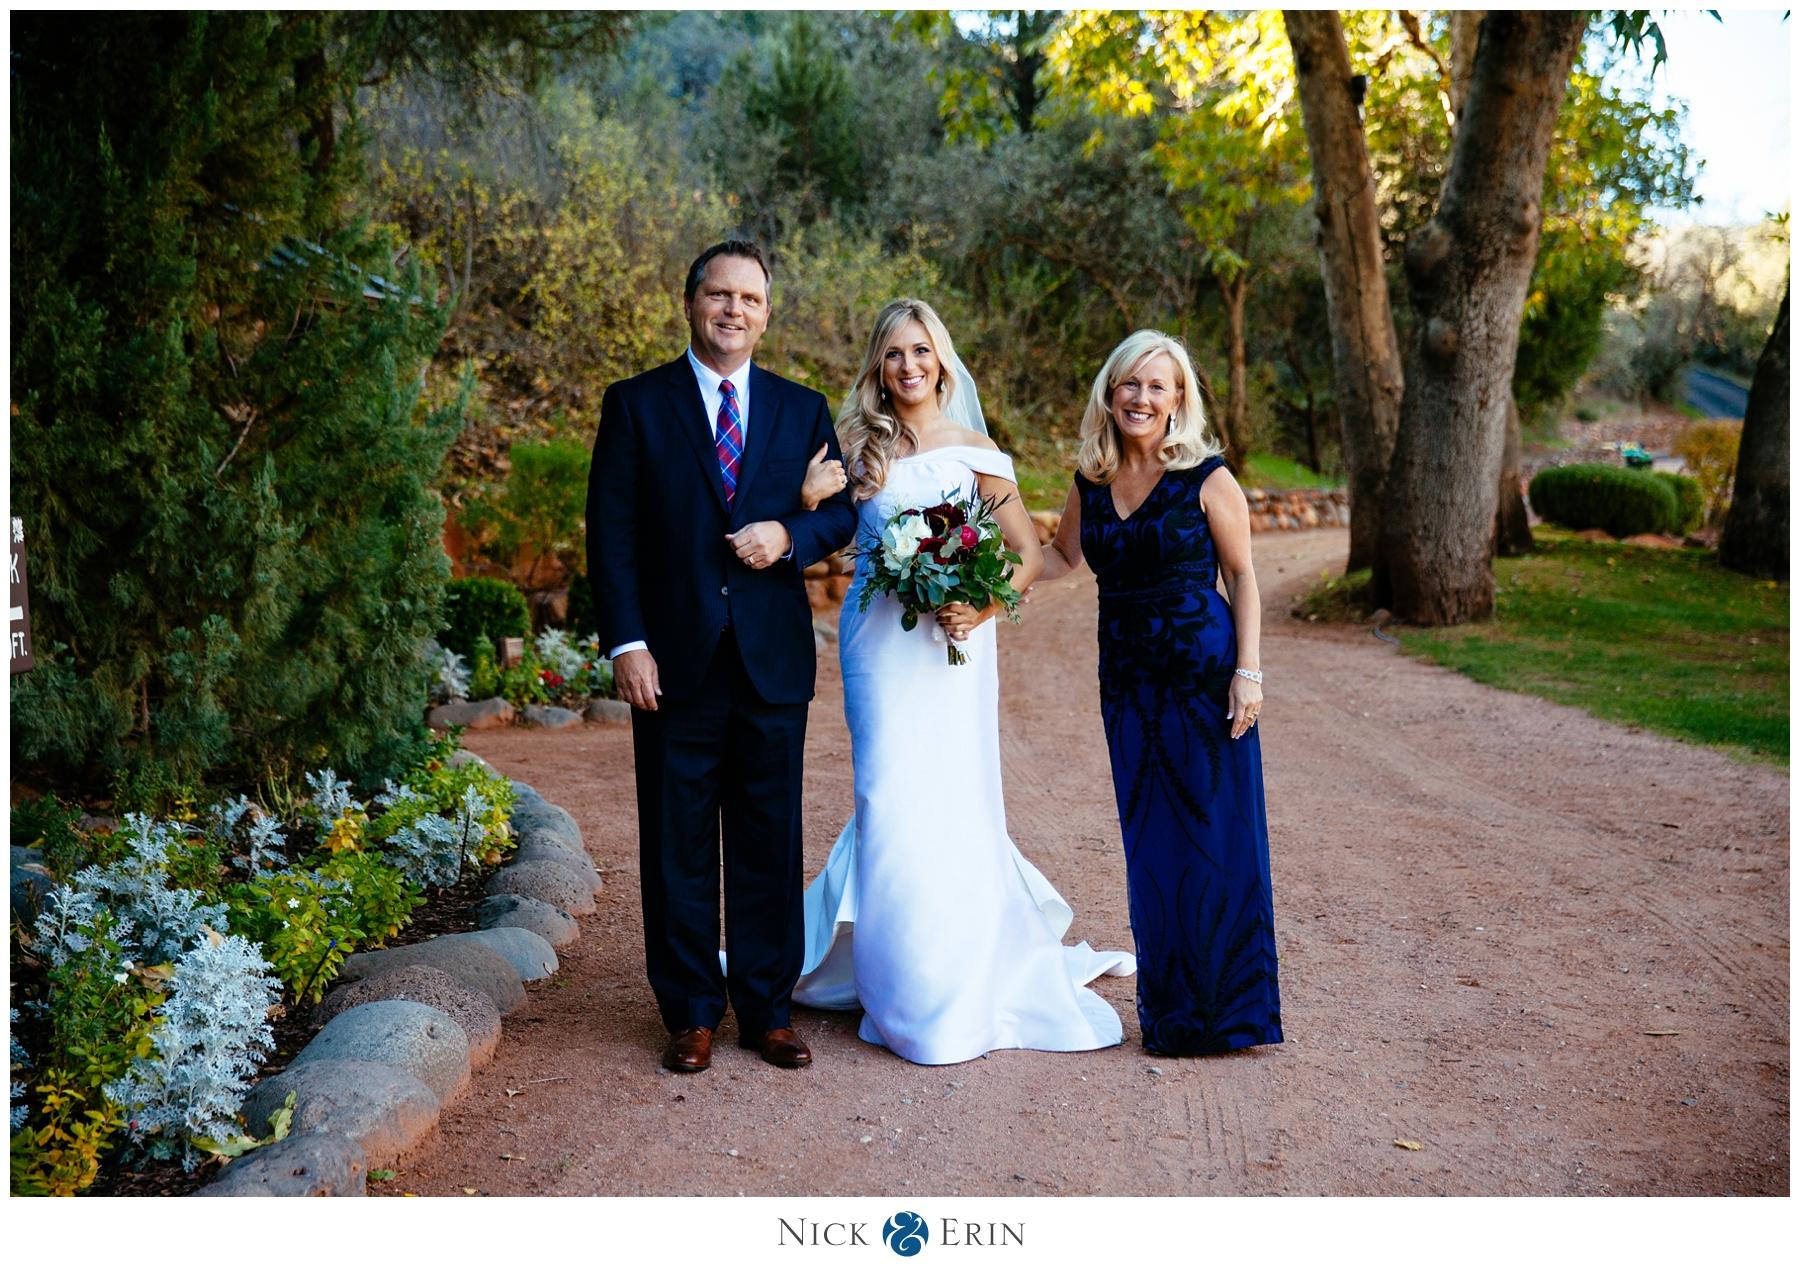 Donner_Photography_Sedona Arizona Wedding_Alissa and Tom_0033